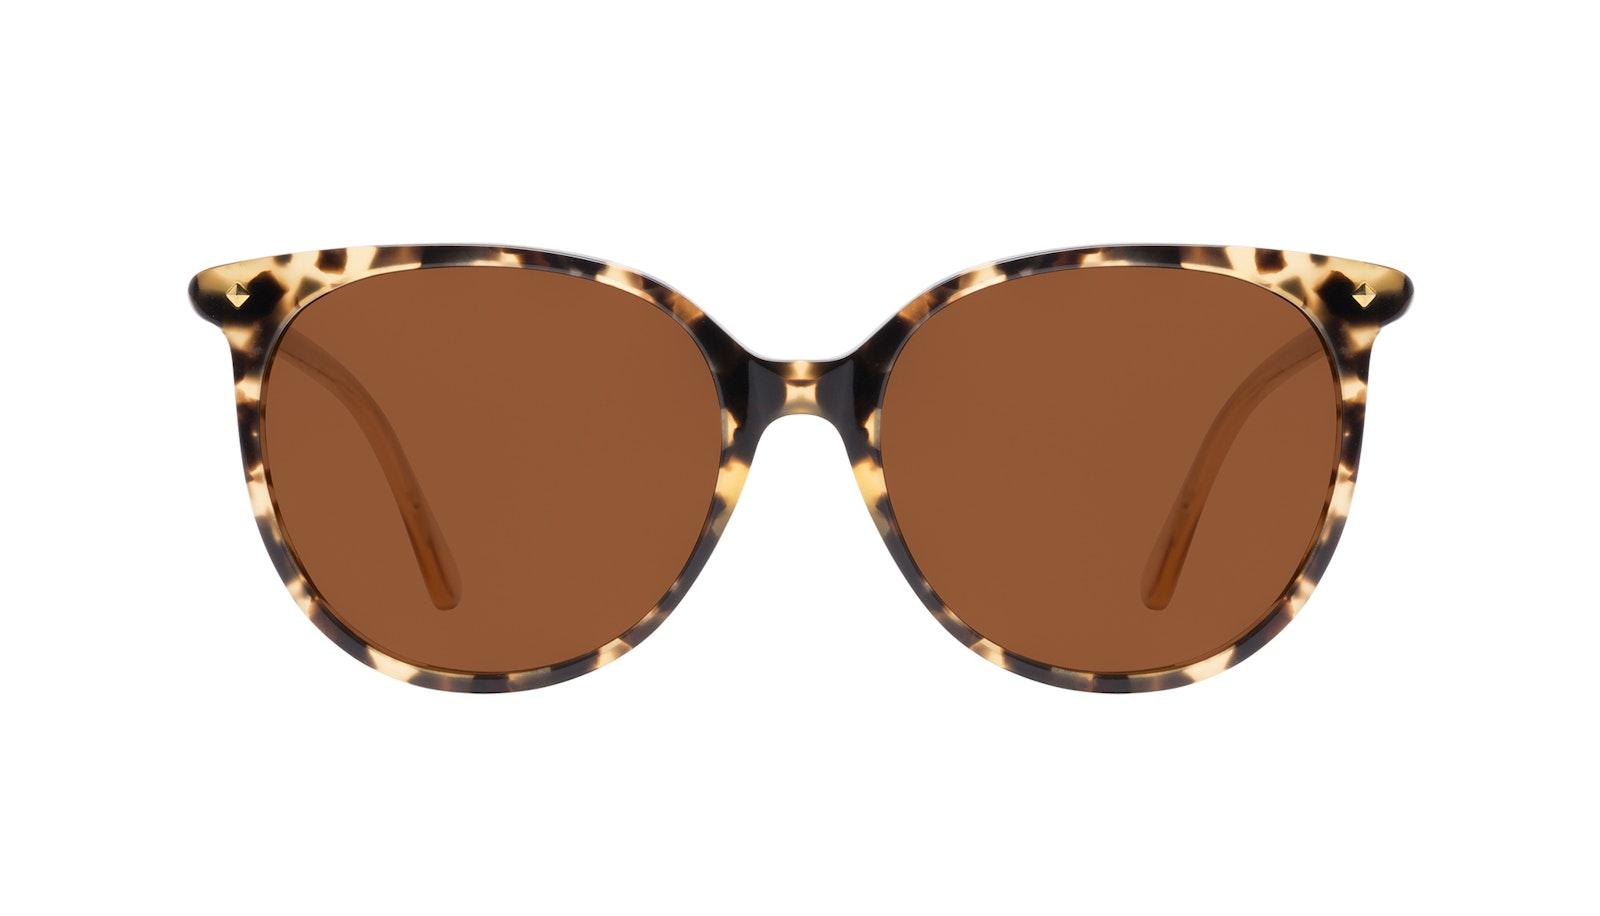 Affordable Fashion Glasses Round Sunglasses Women Area Petite Bingal